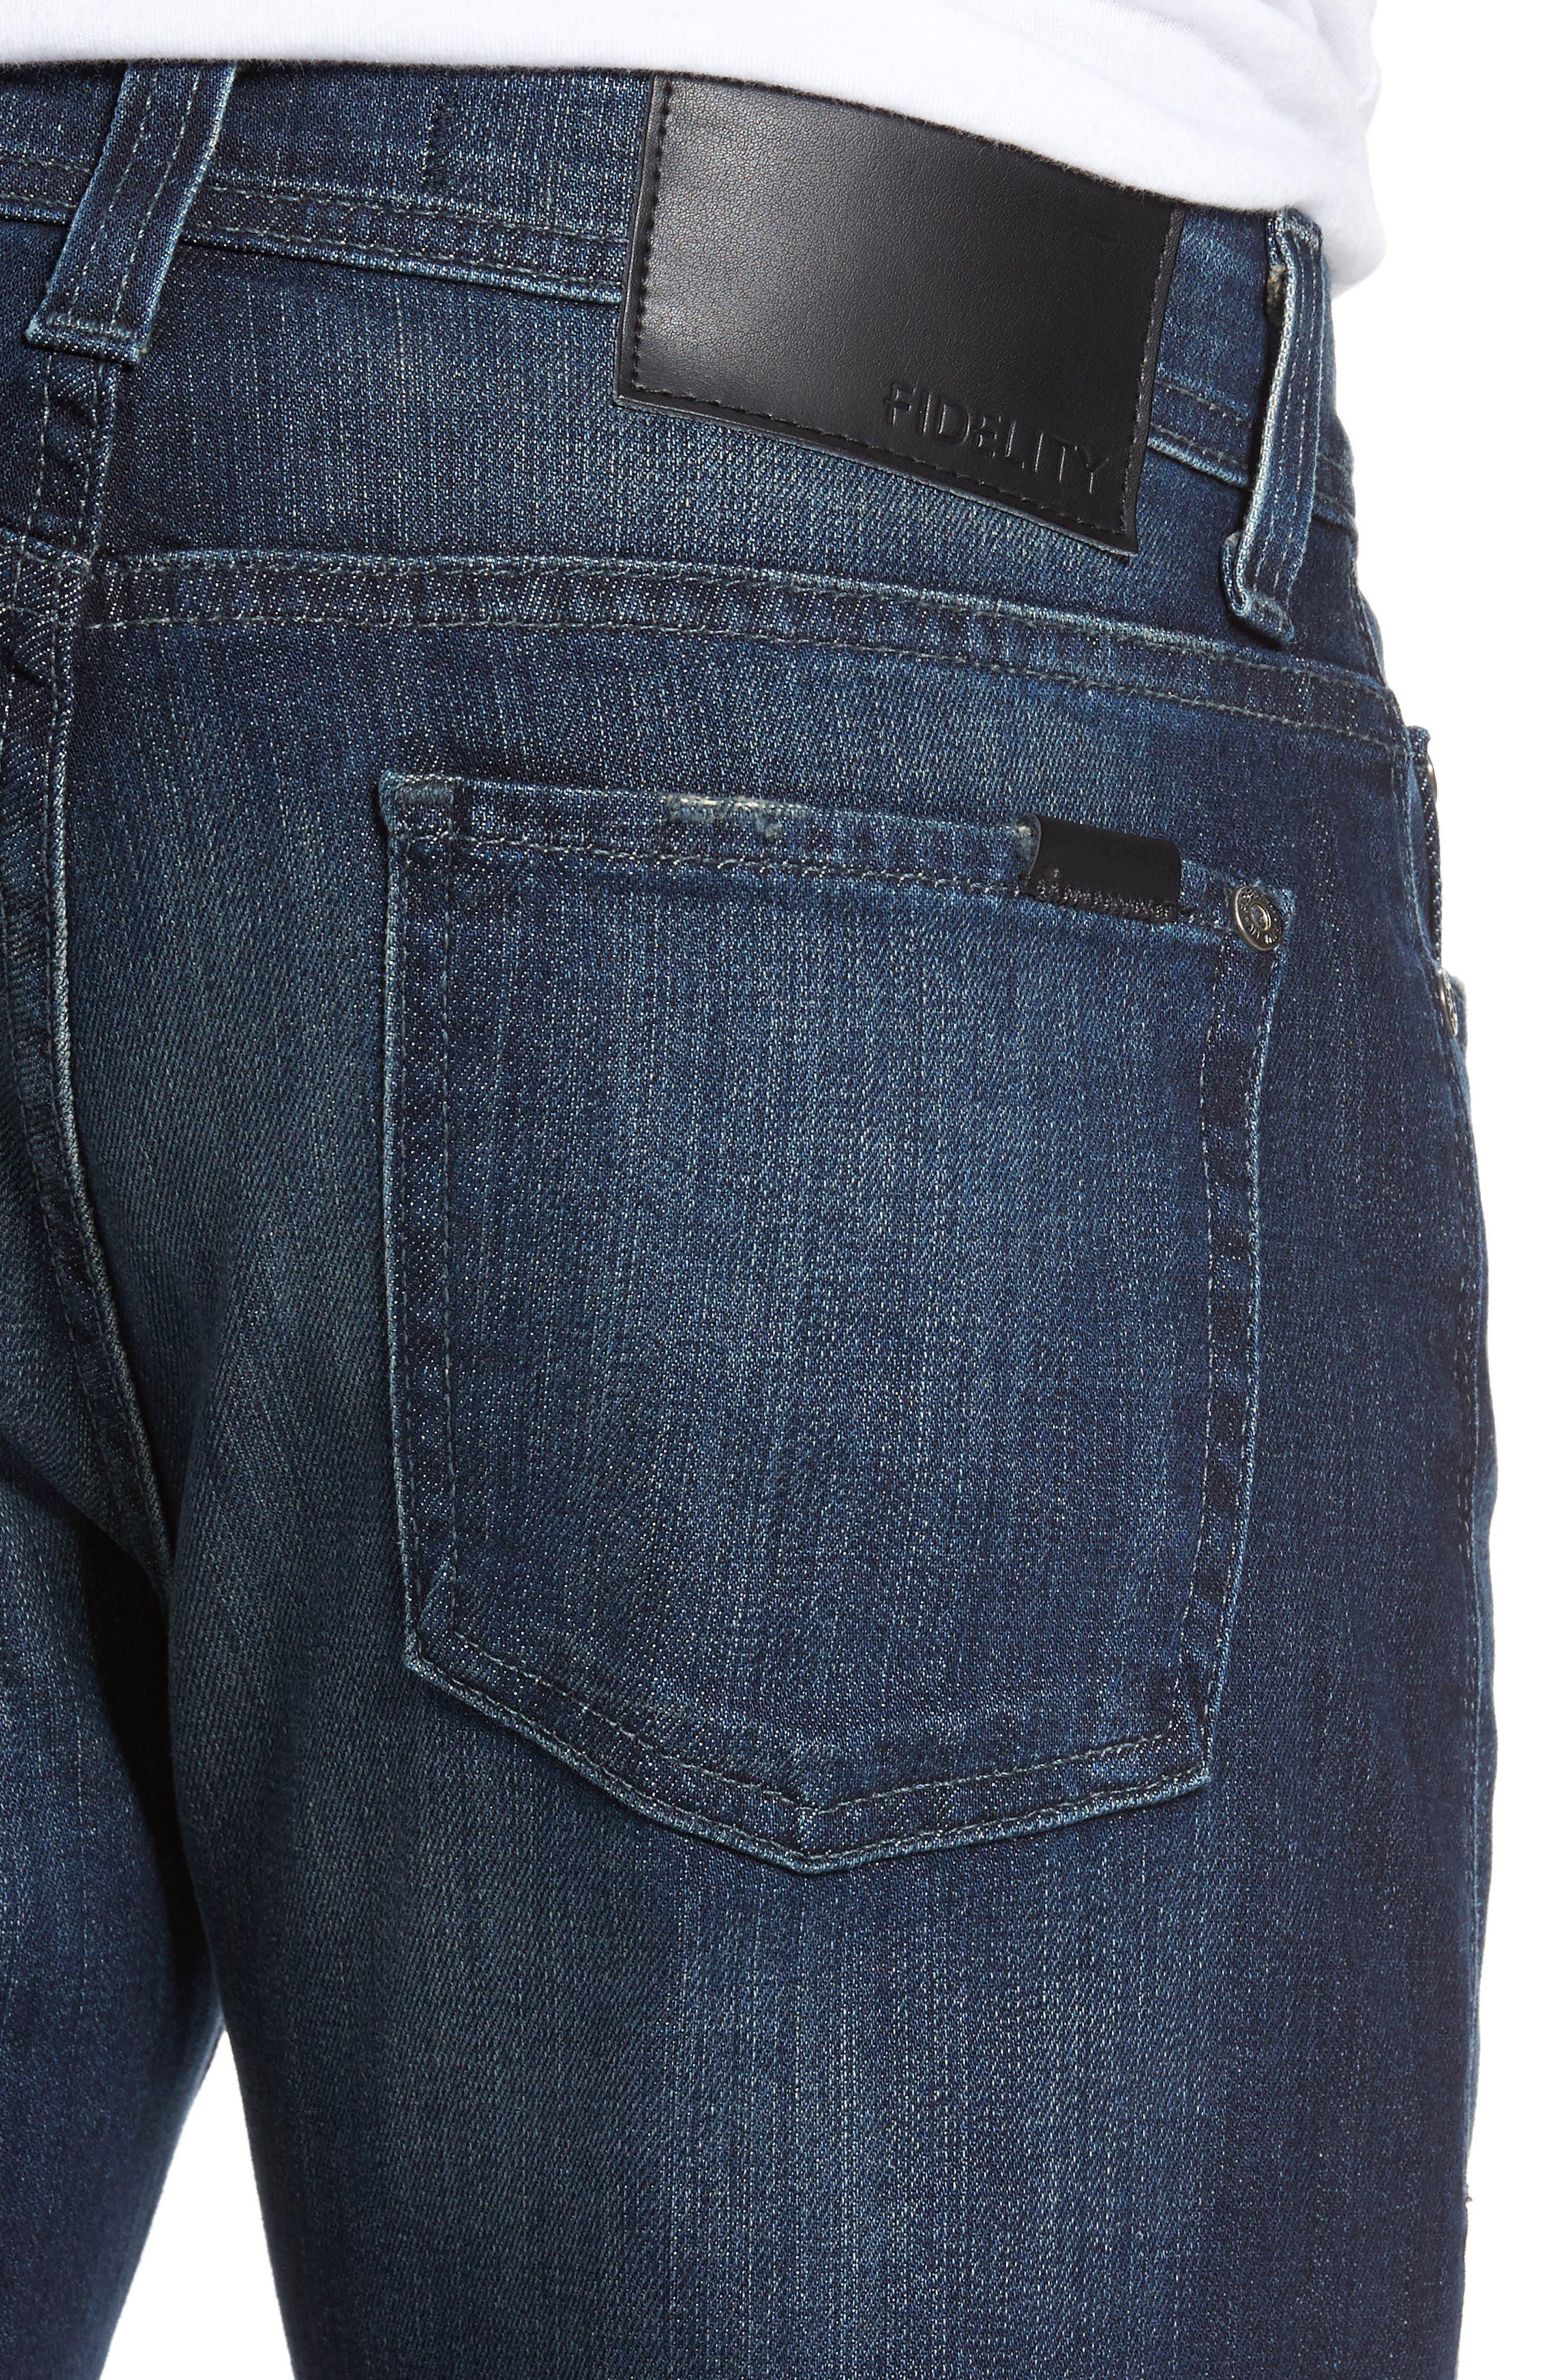 Jimmy Slim Straight Leg Jeans,                             Alternate thumbnail 4, color,